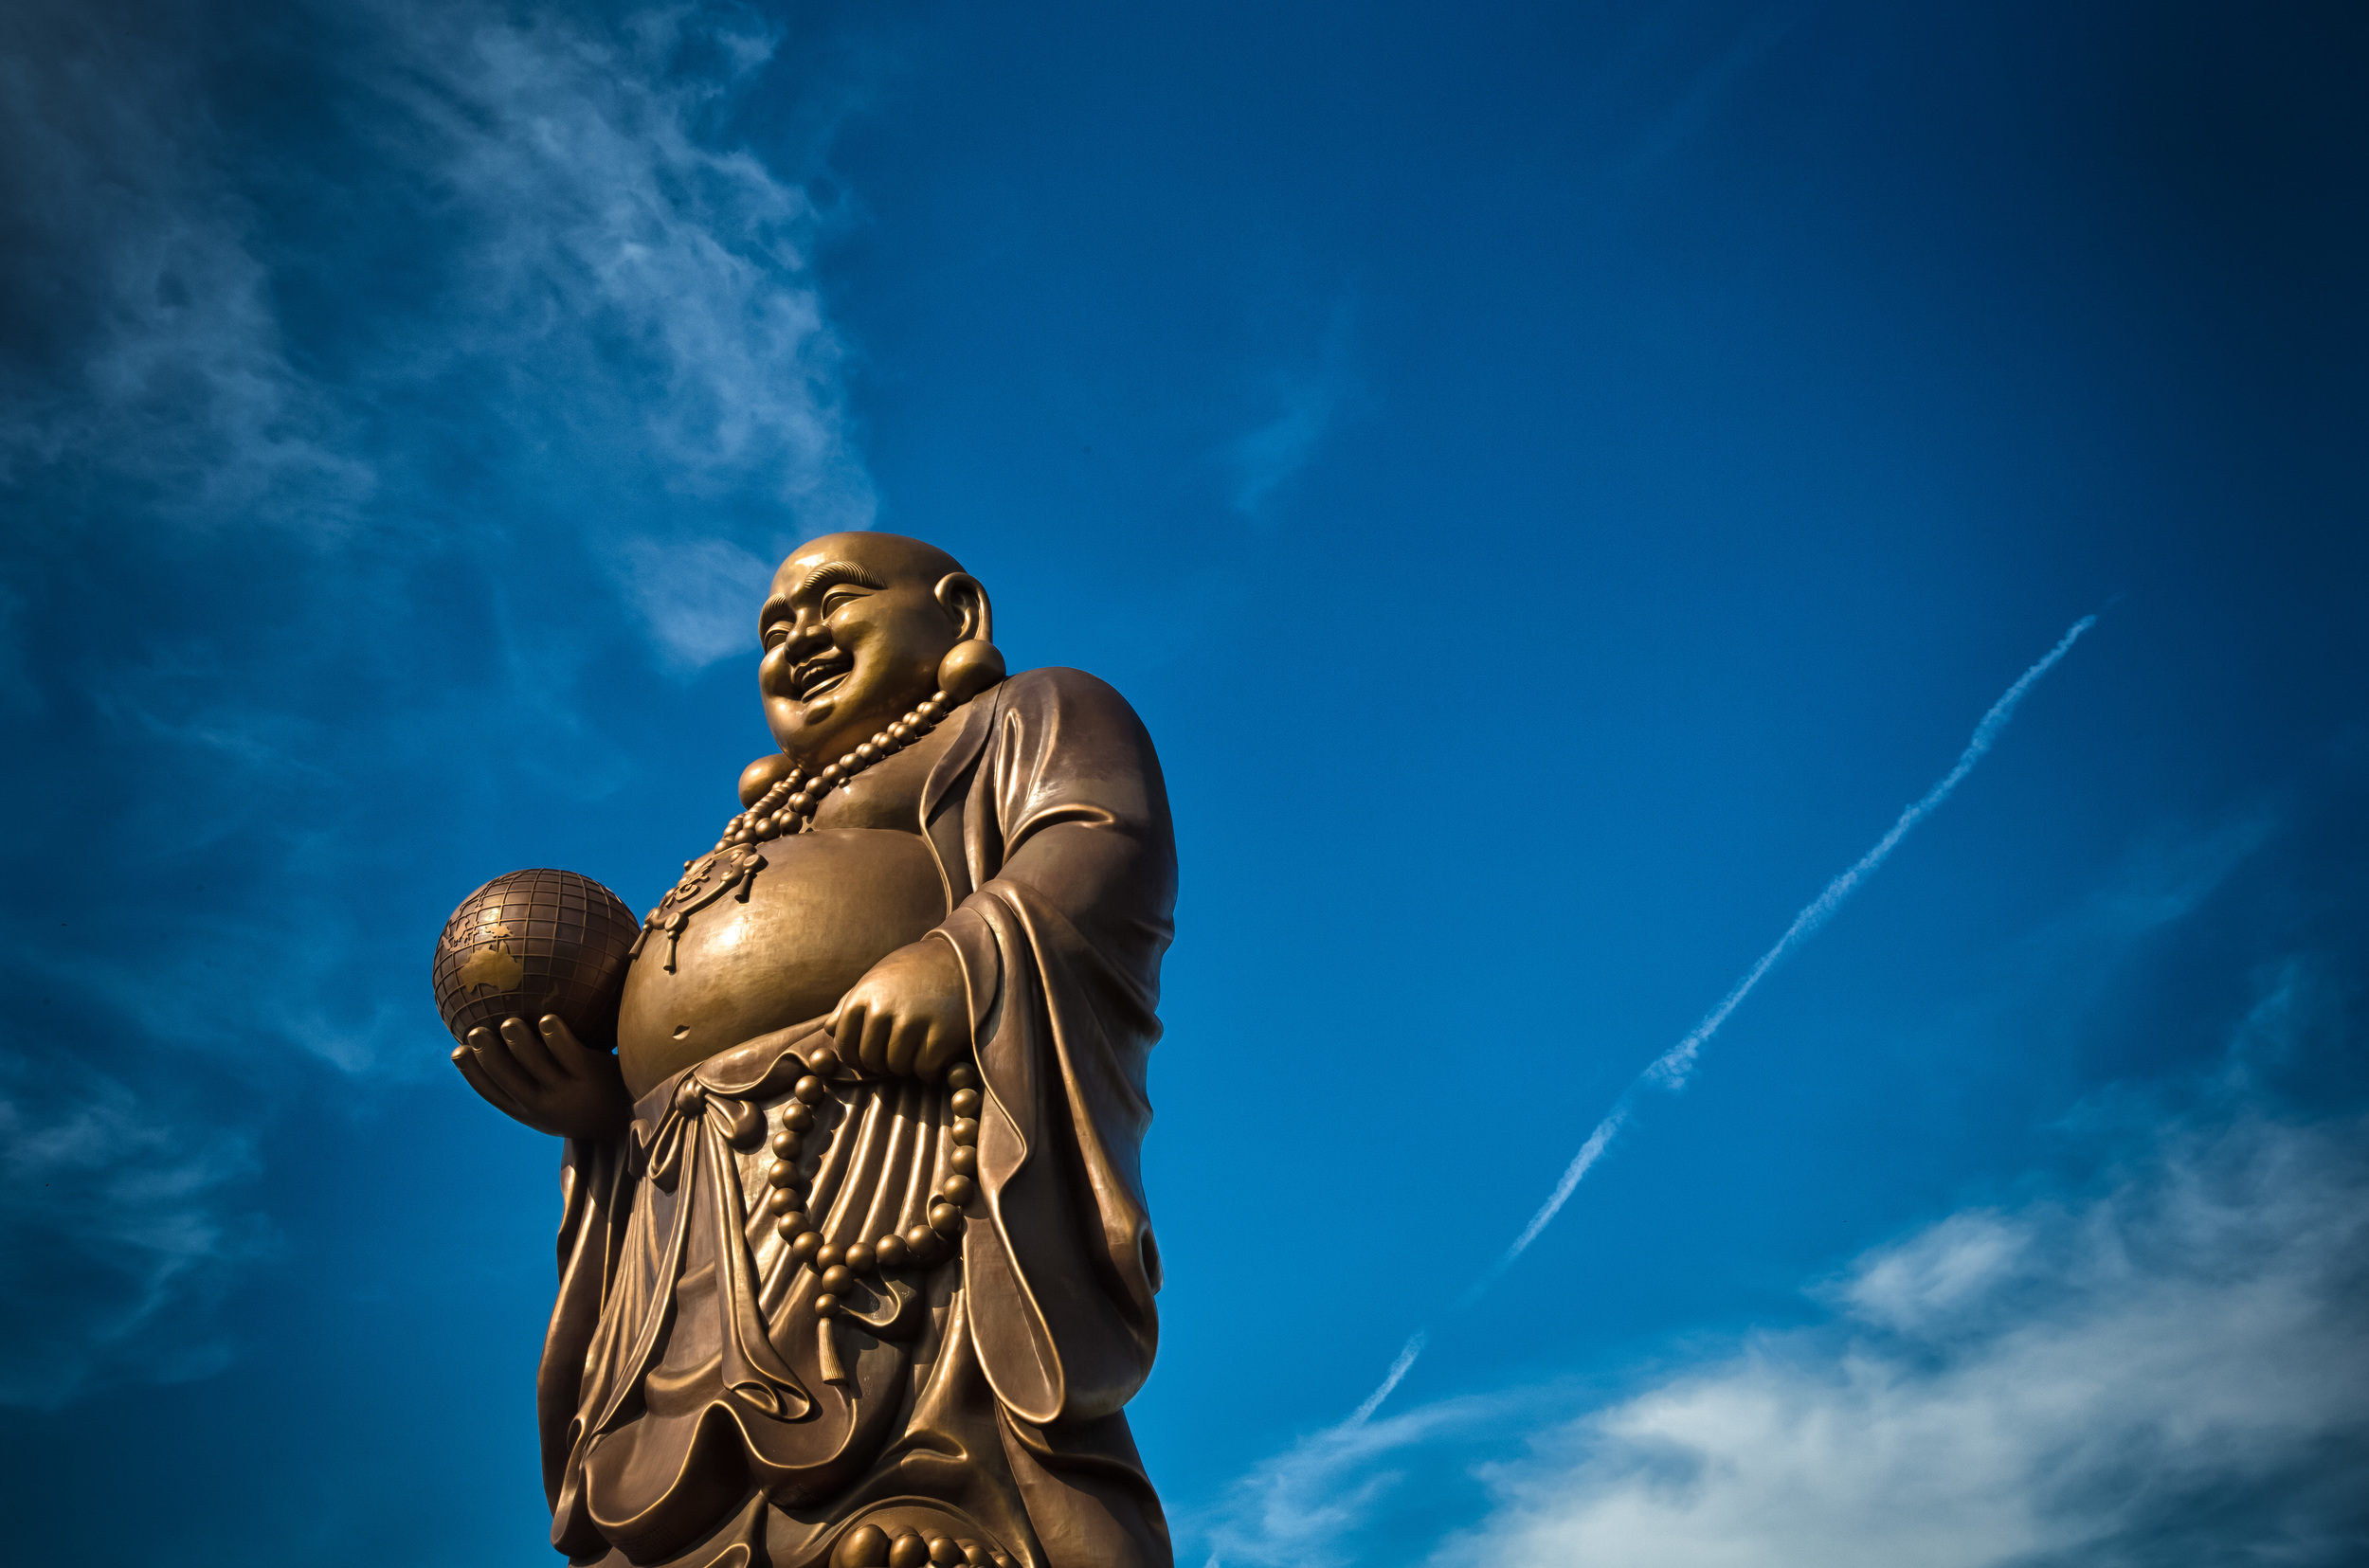 75m tall bronze statue of the Medicine Buddha